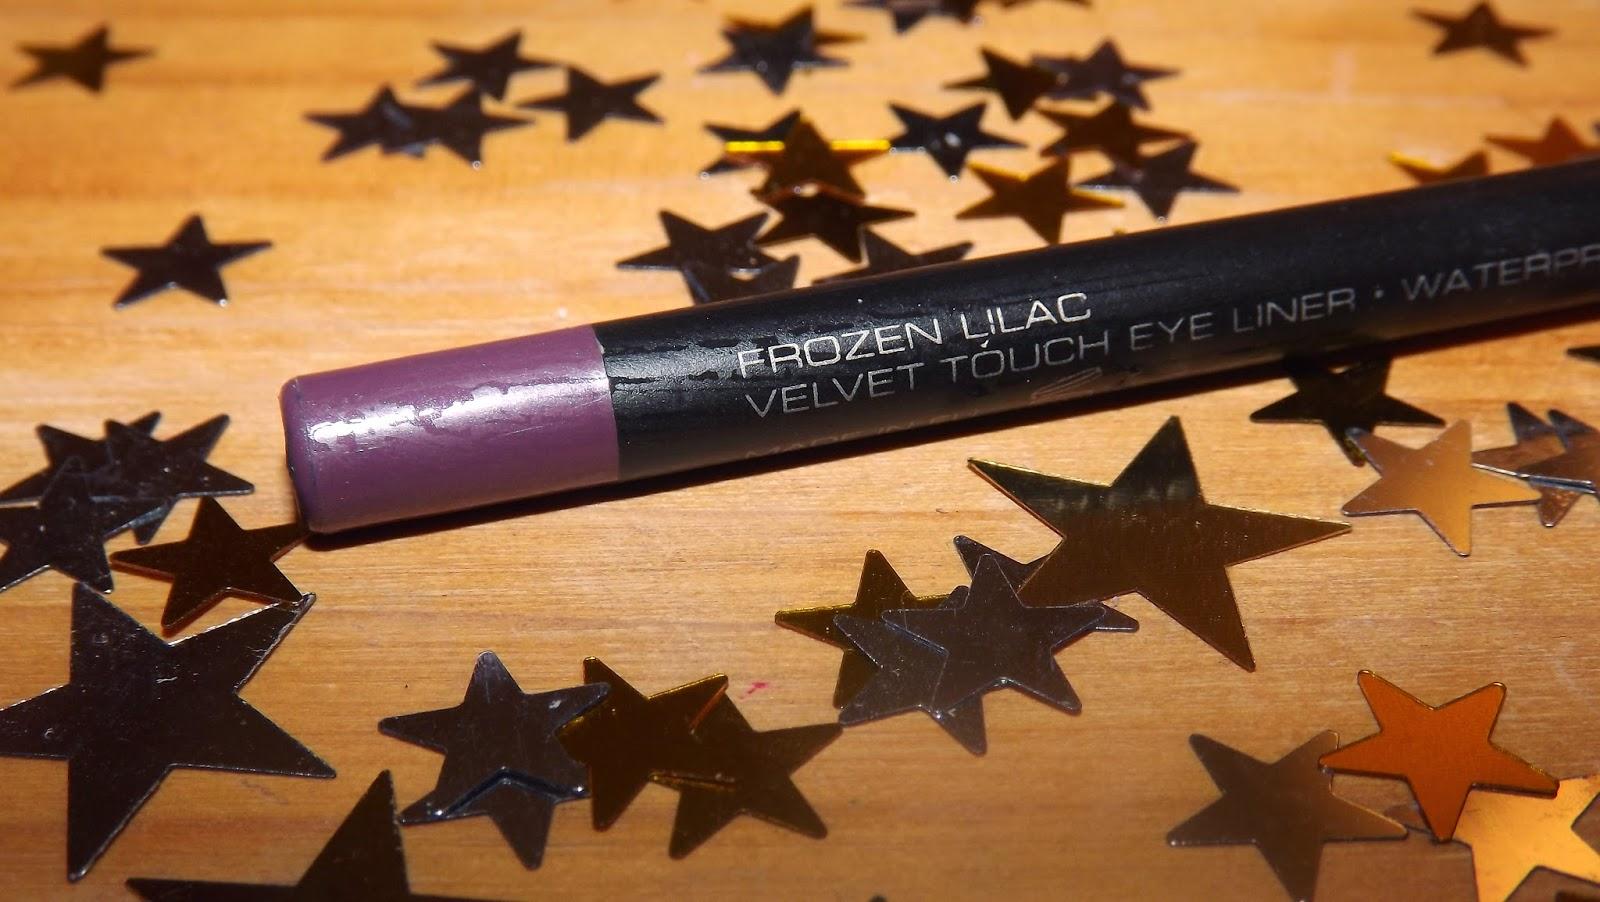 gosh eyeliner frozen lilac